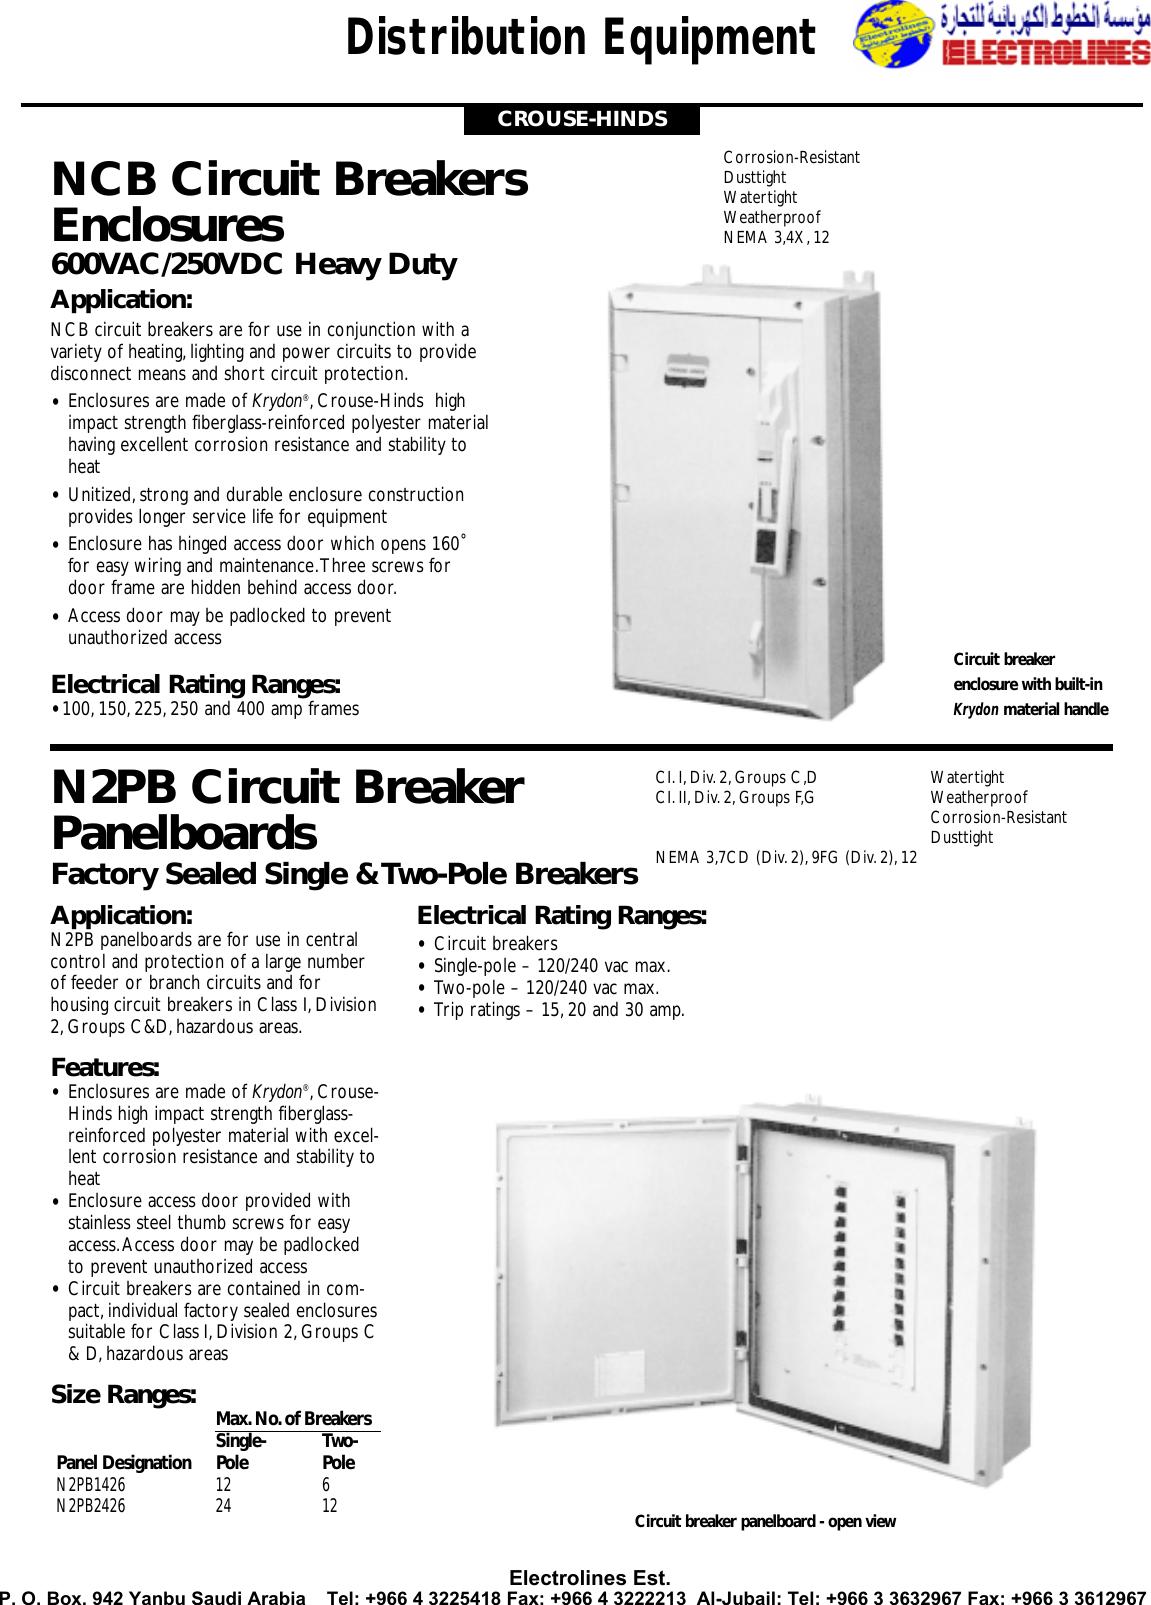 GE GENERAL ELECTRIC TED124060WL NEW CIRCUIT BREAKER 2 POLE  60 AMP 240//480Y VAC